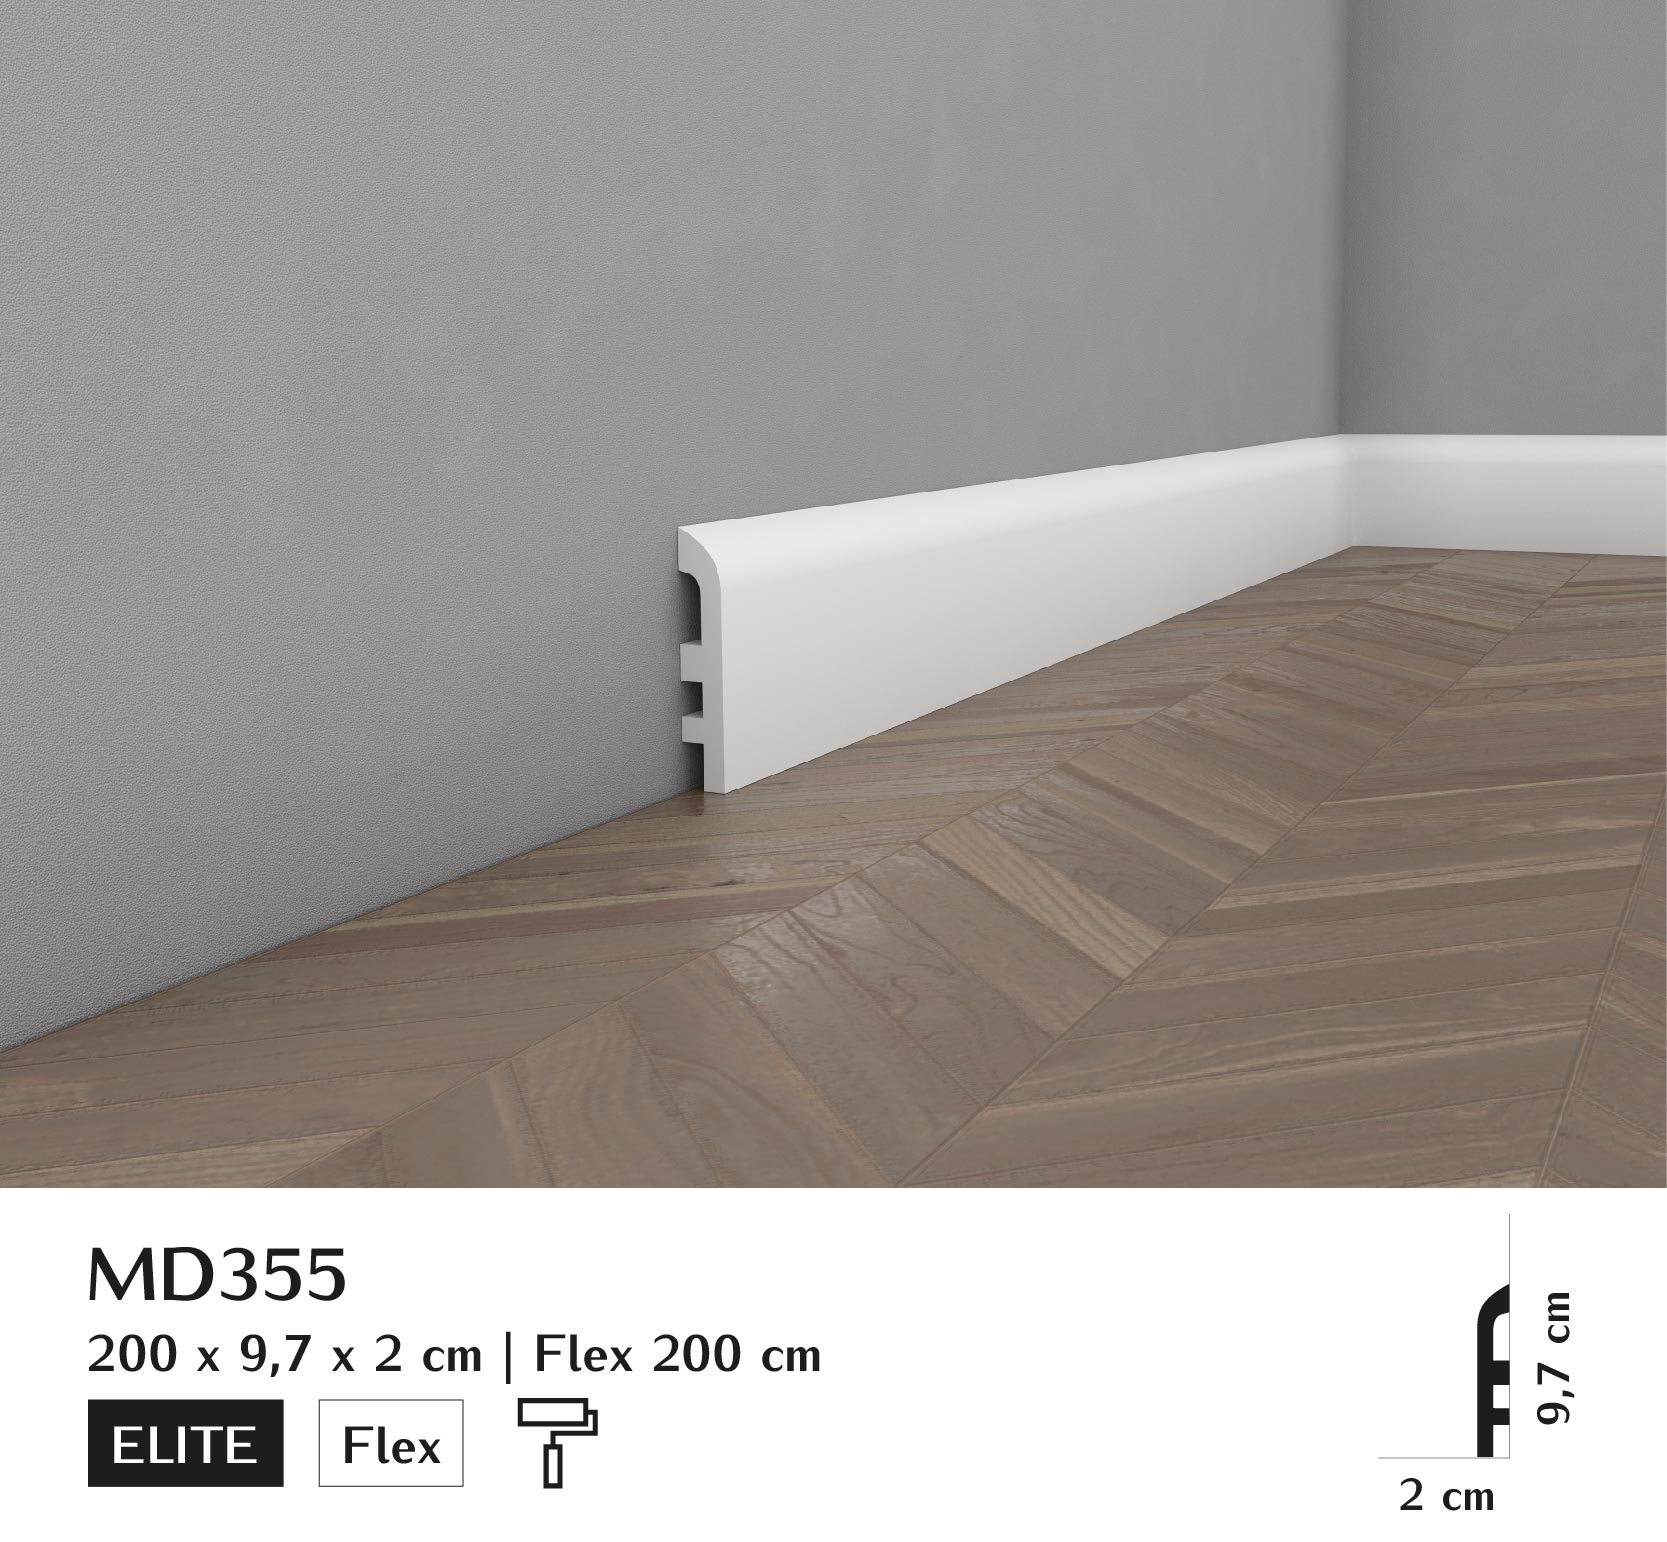 Md355